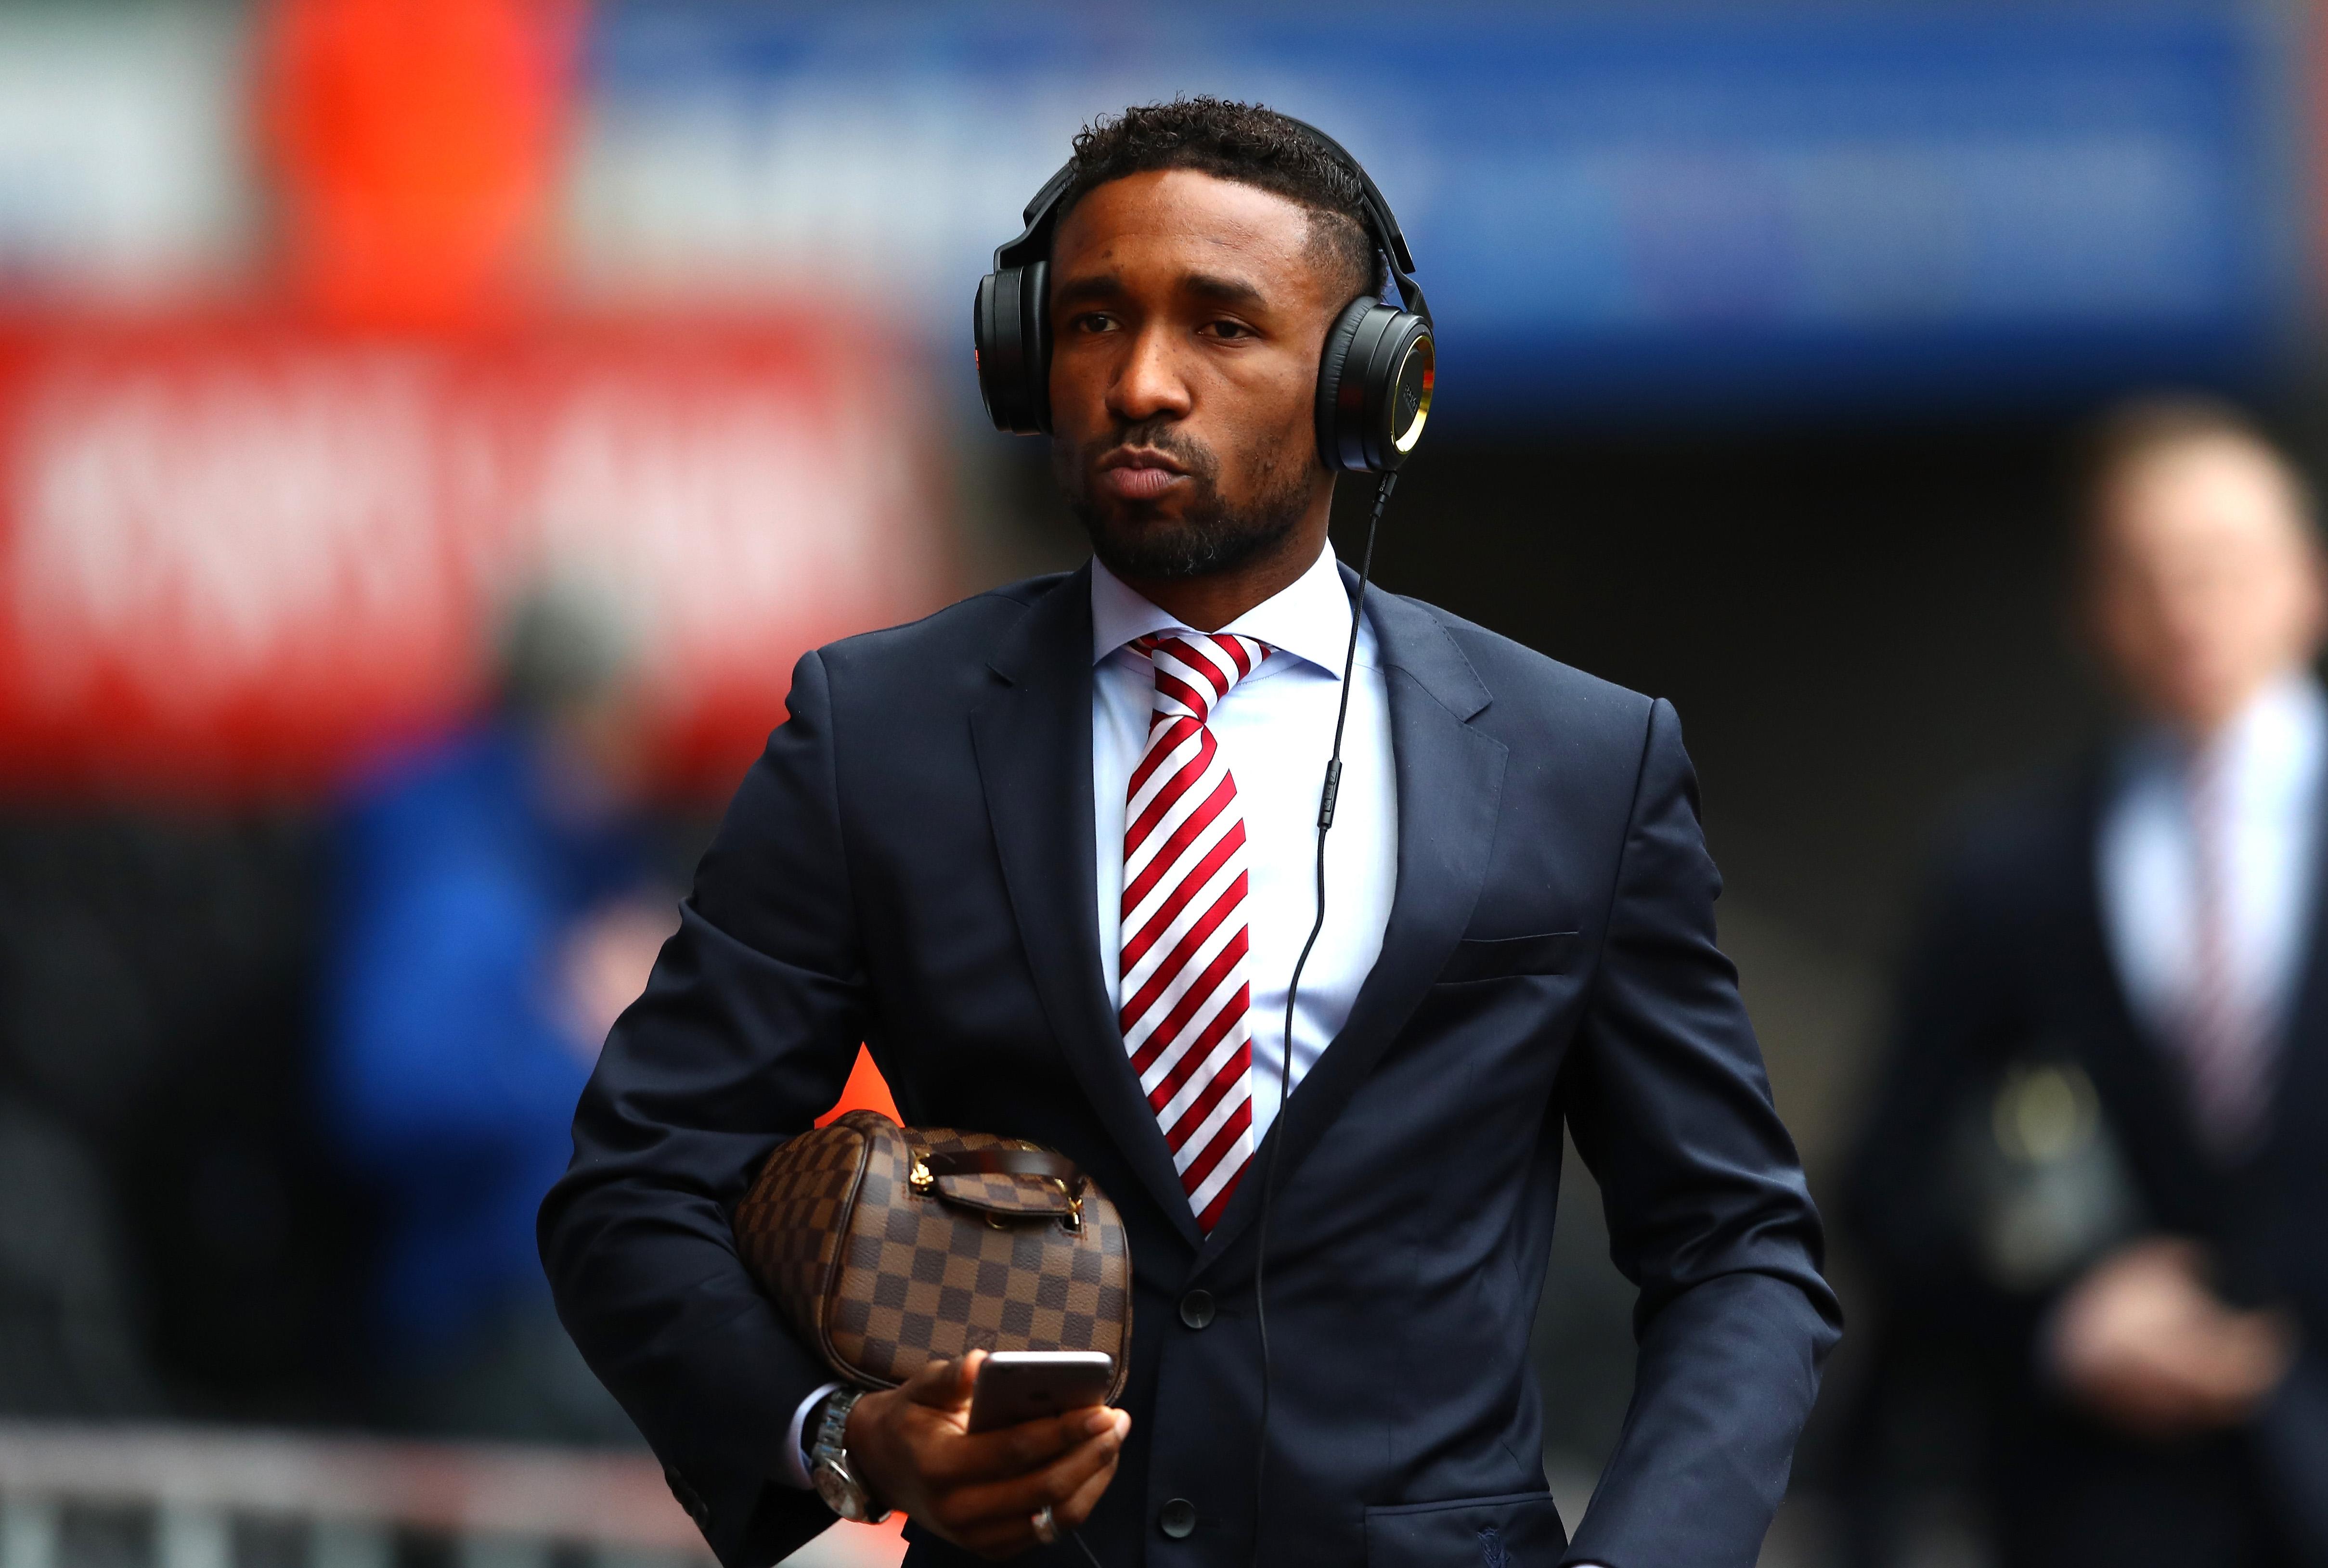 West Ham target Sunderland striker Jermain Defoe in £6m January raid